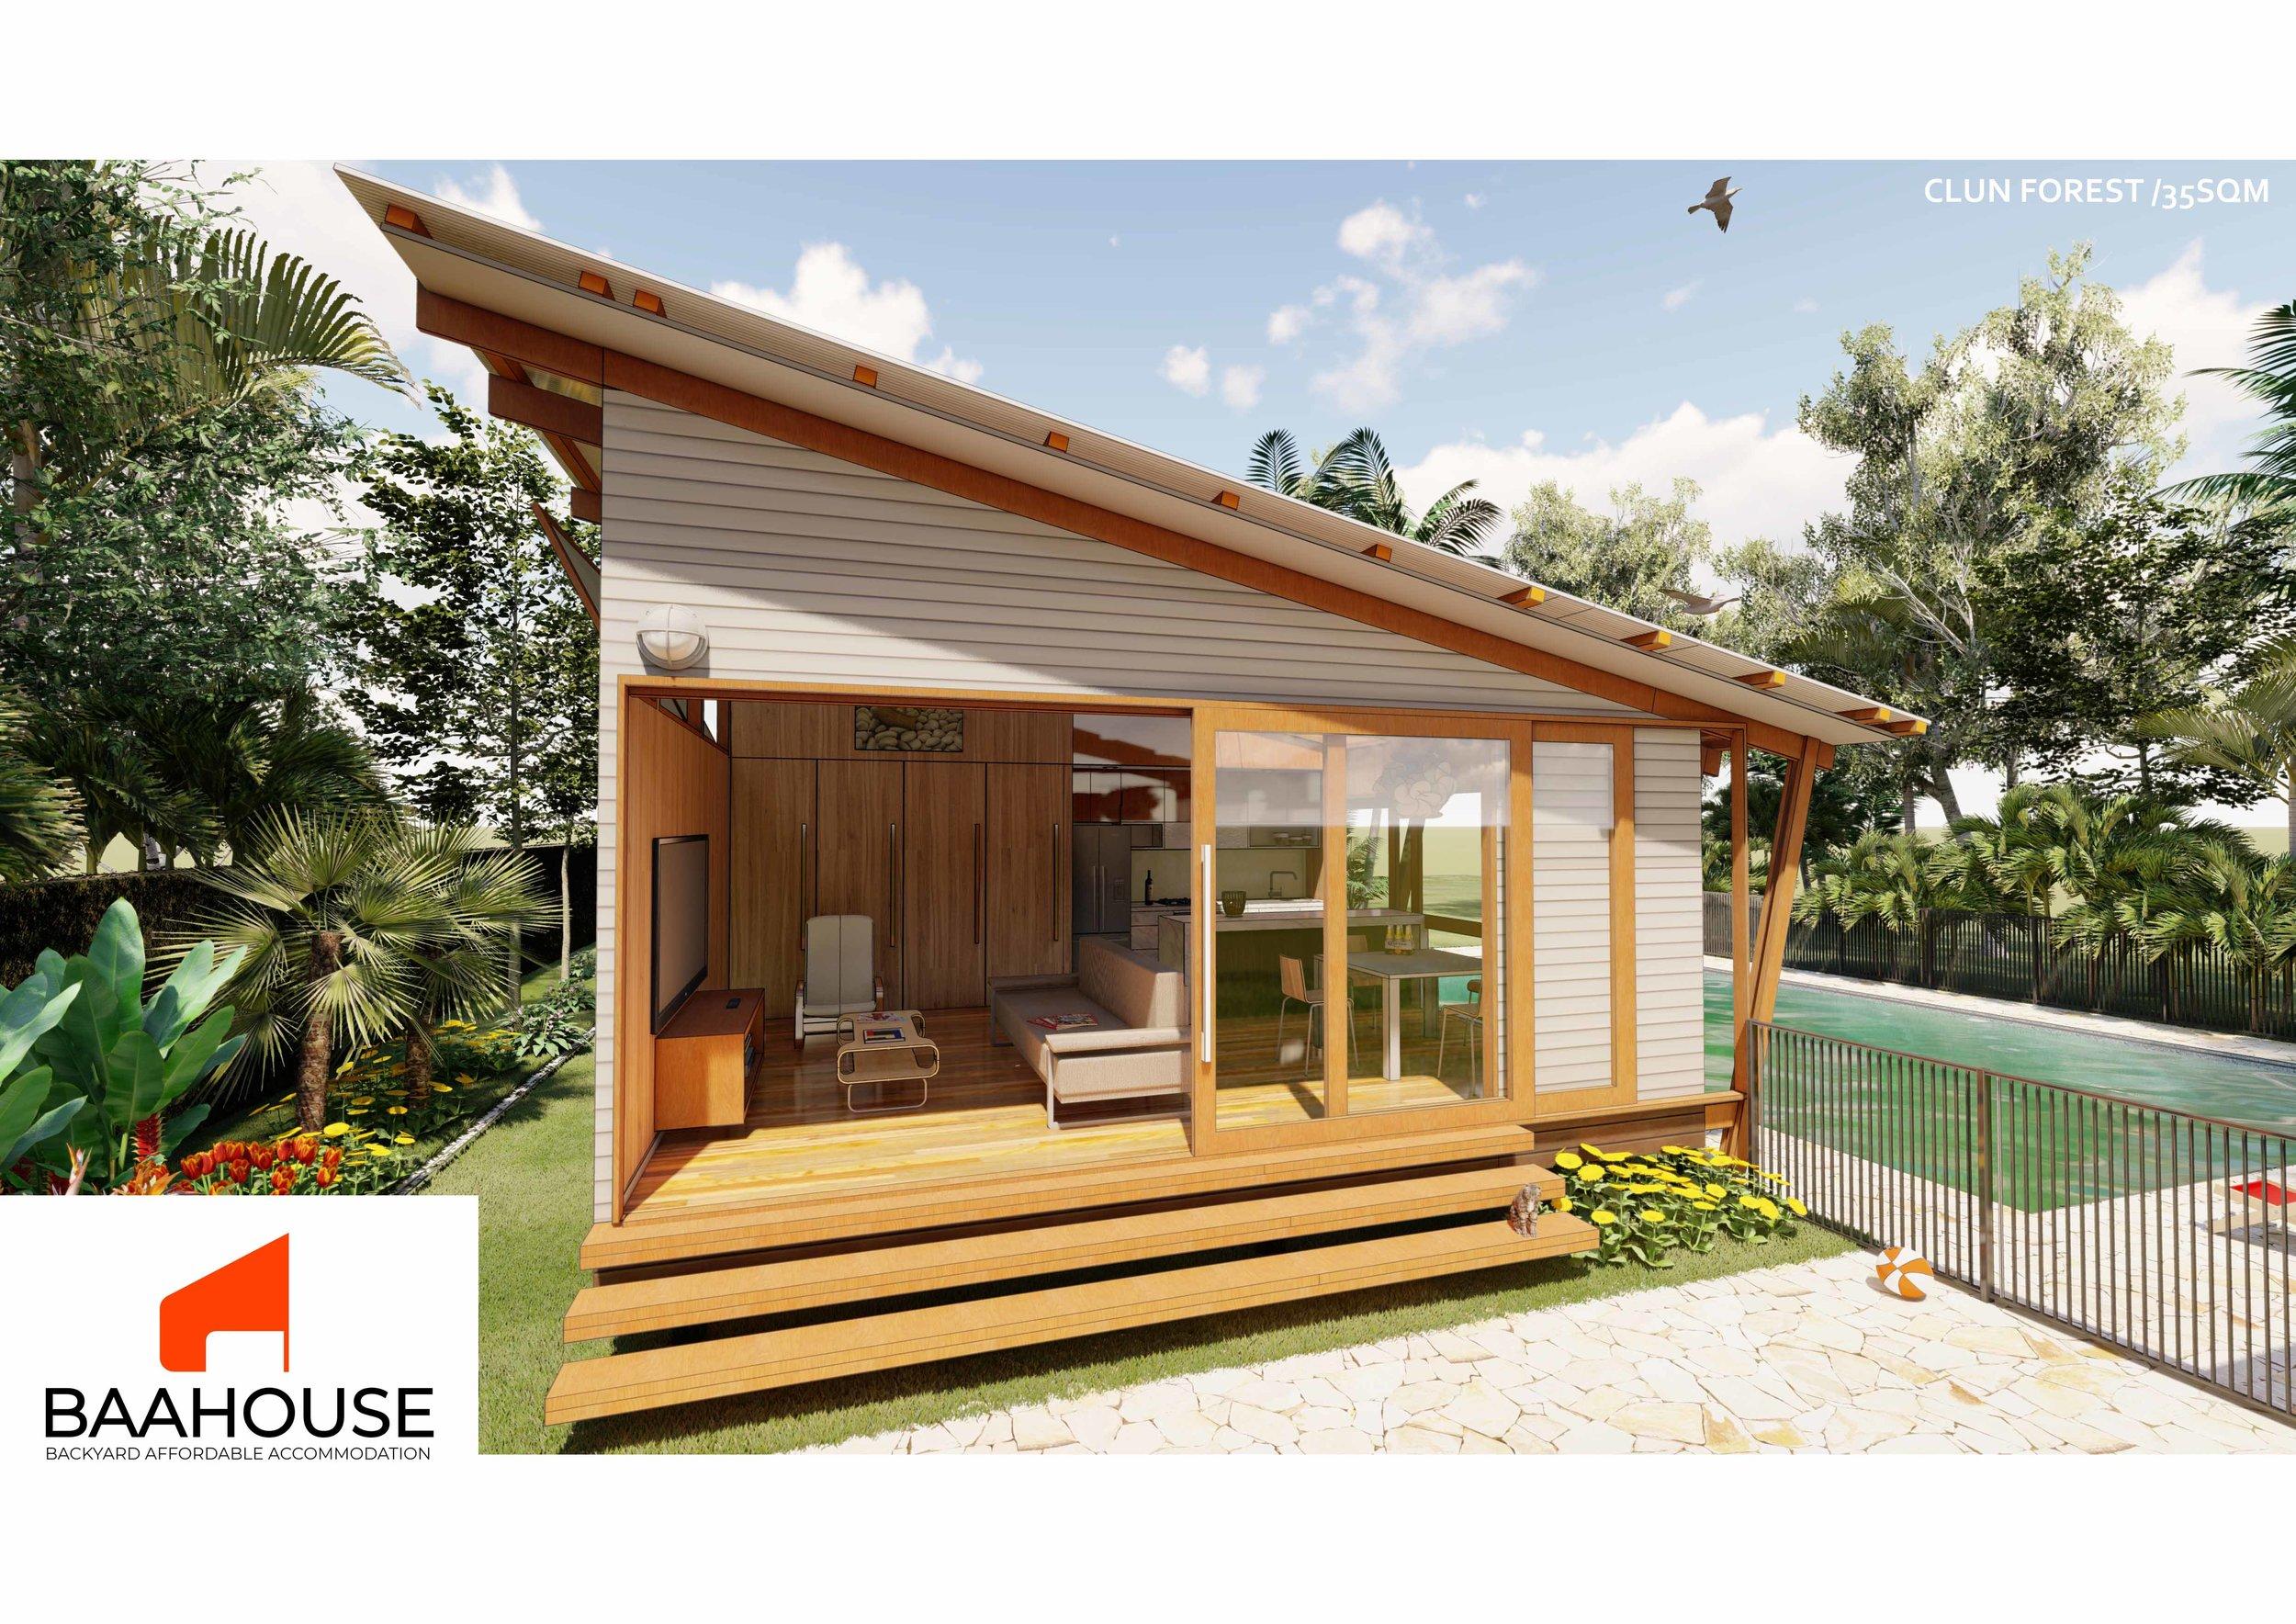 Clun Forest Exterior 2019 web.jpg